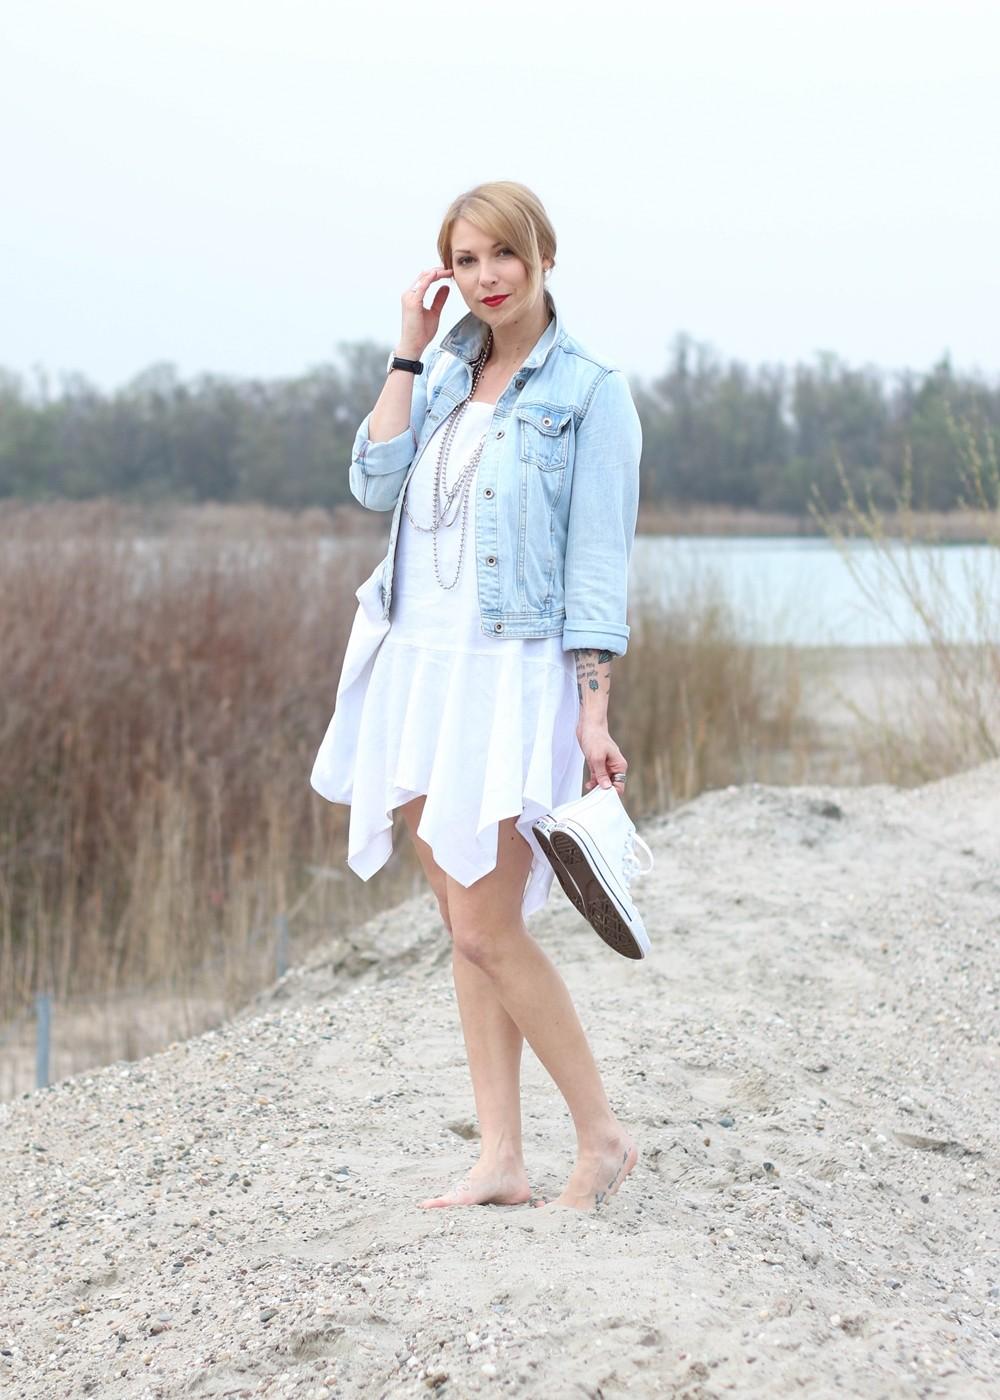 Fashionblogger Karlsruhe Outfit Strand weisses Kleid Jeansjacke Lederchucks (4)